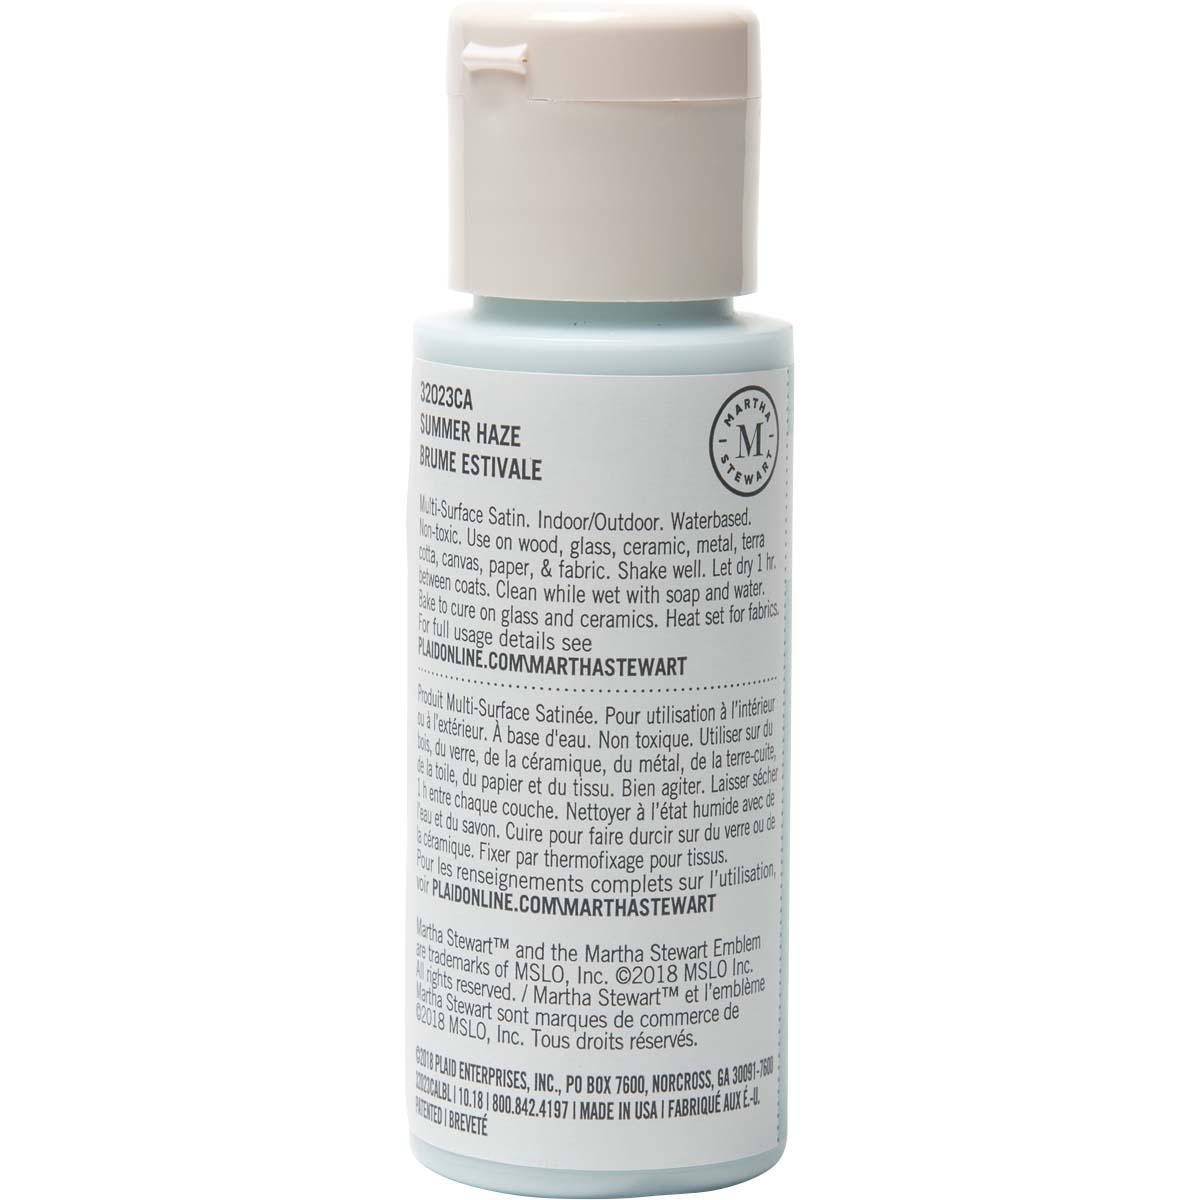 Martha Stewart® 2oz Multi-Surface Satin Acrylic Craft Paint - Summer Haze